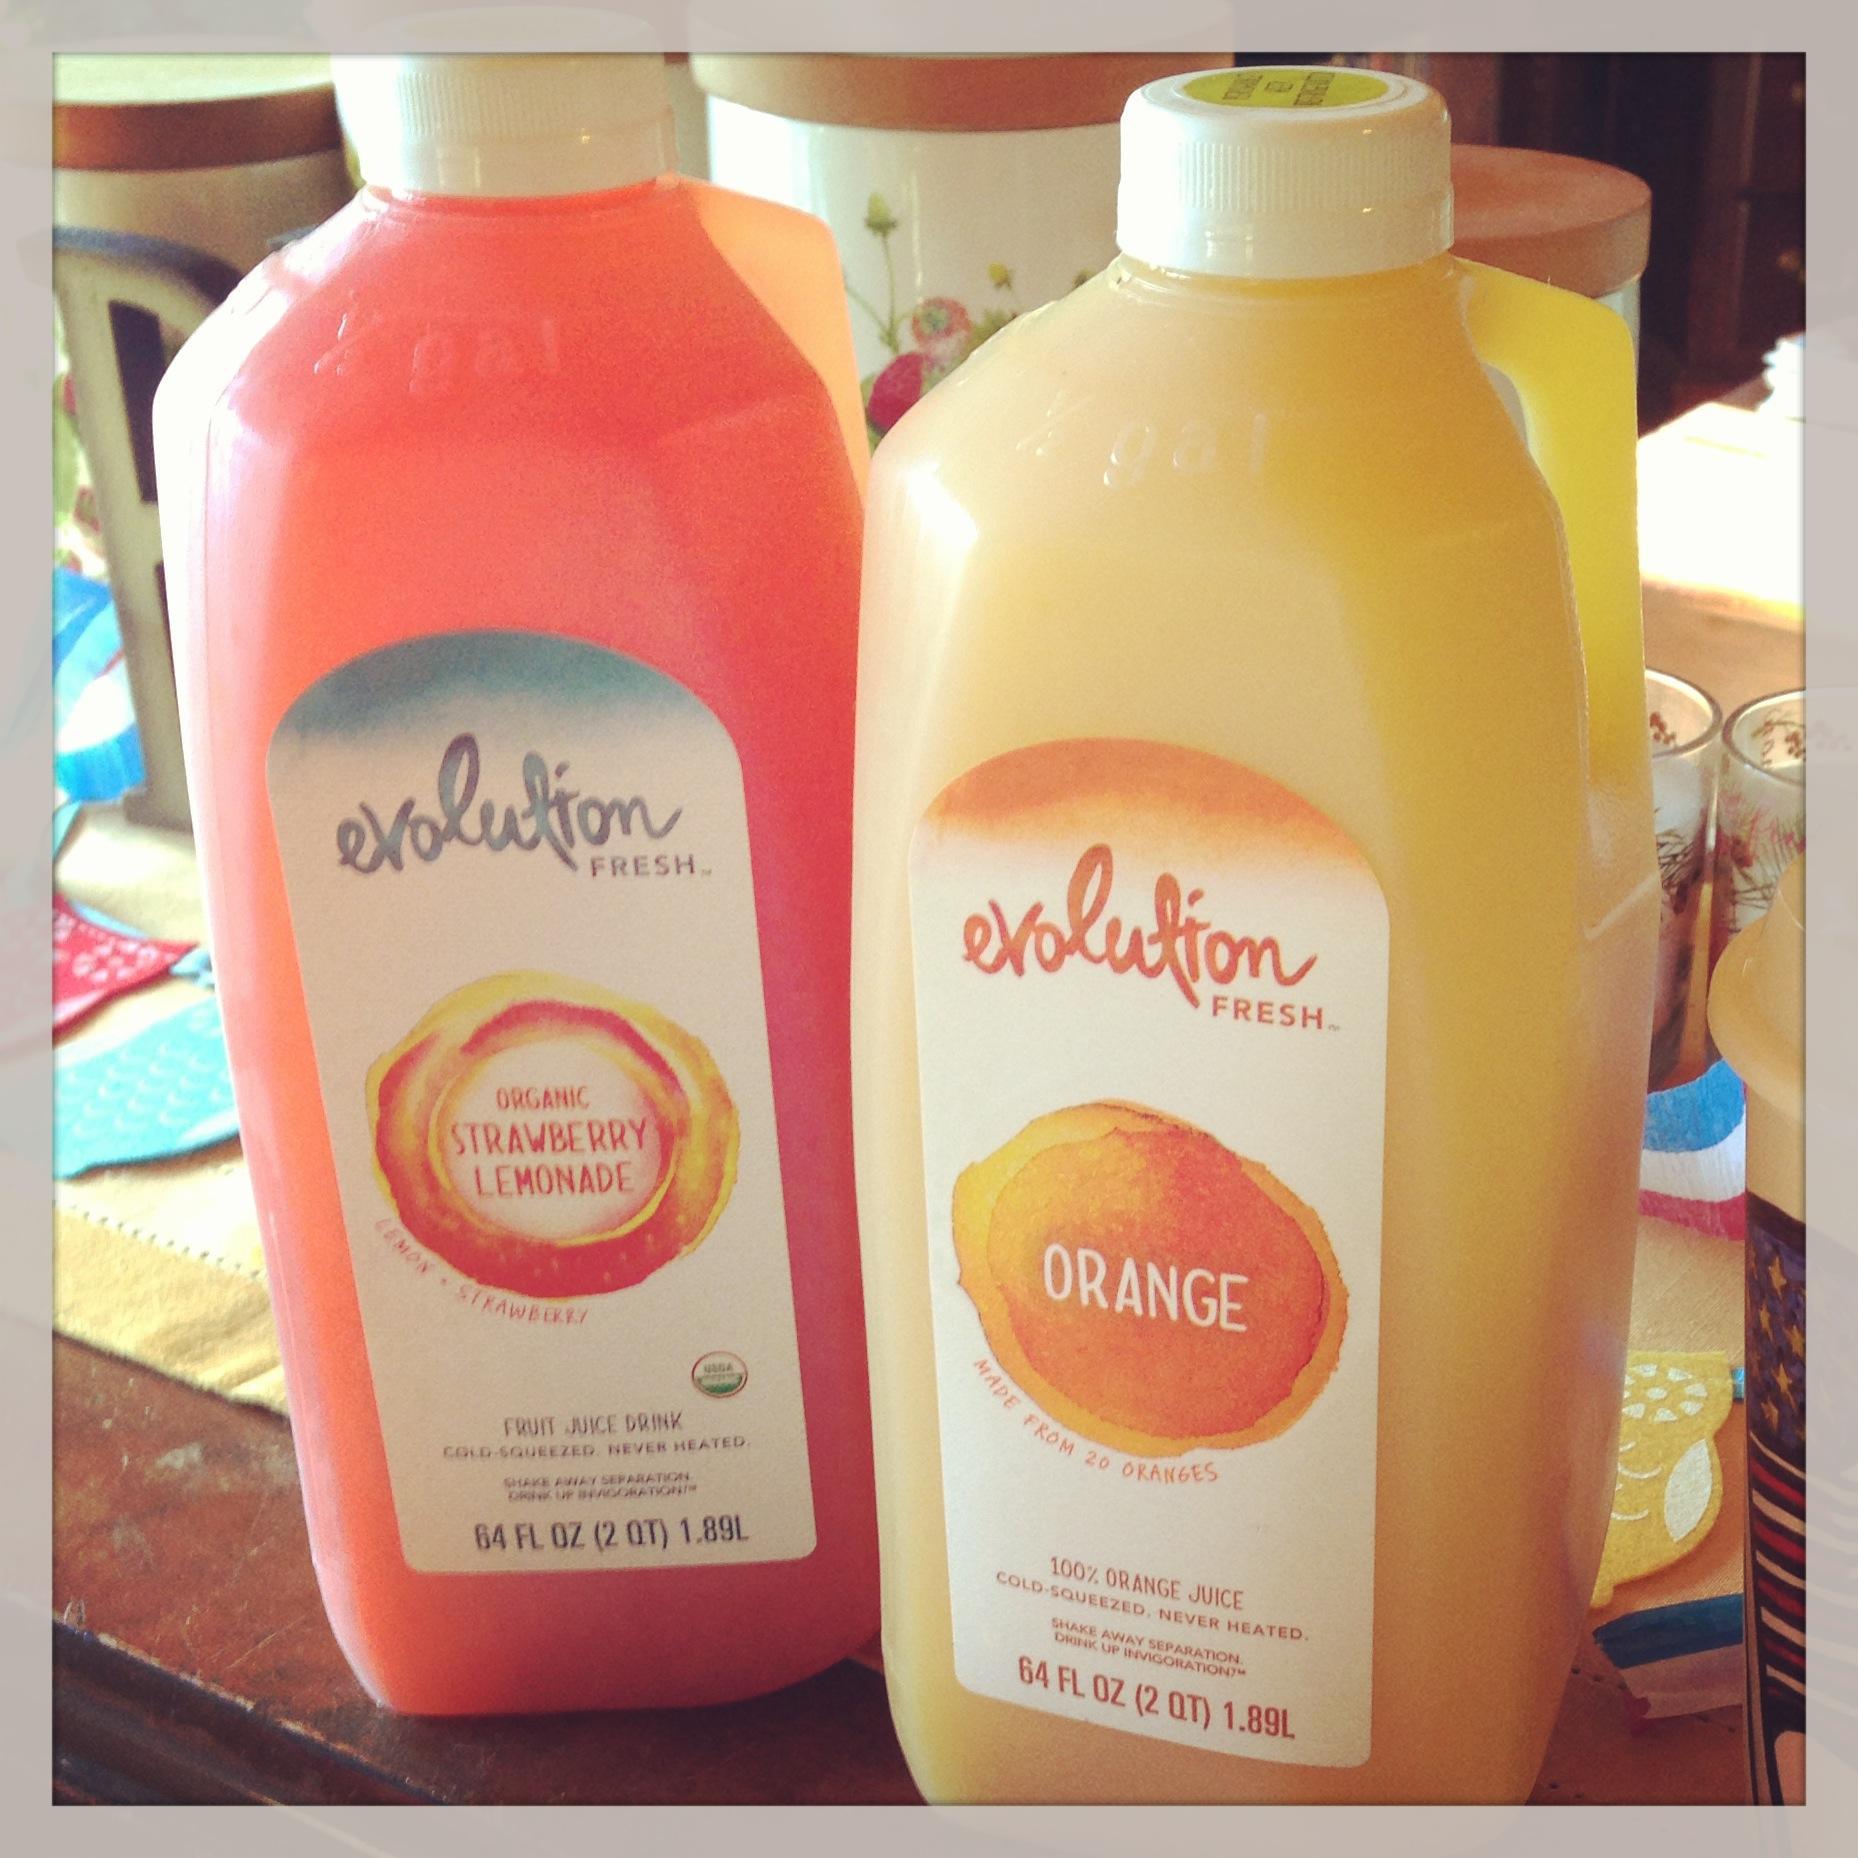 Large Evolution Fresh juices